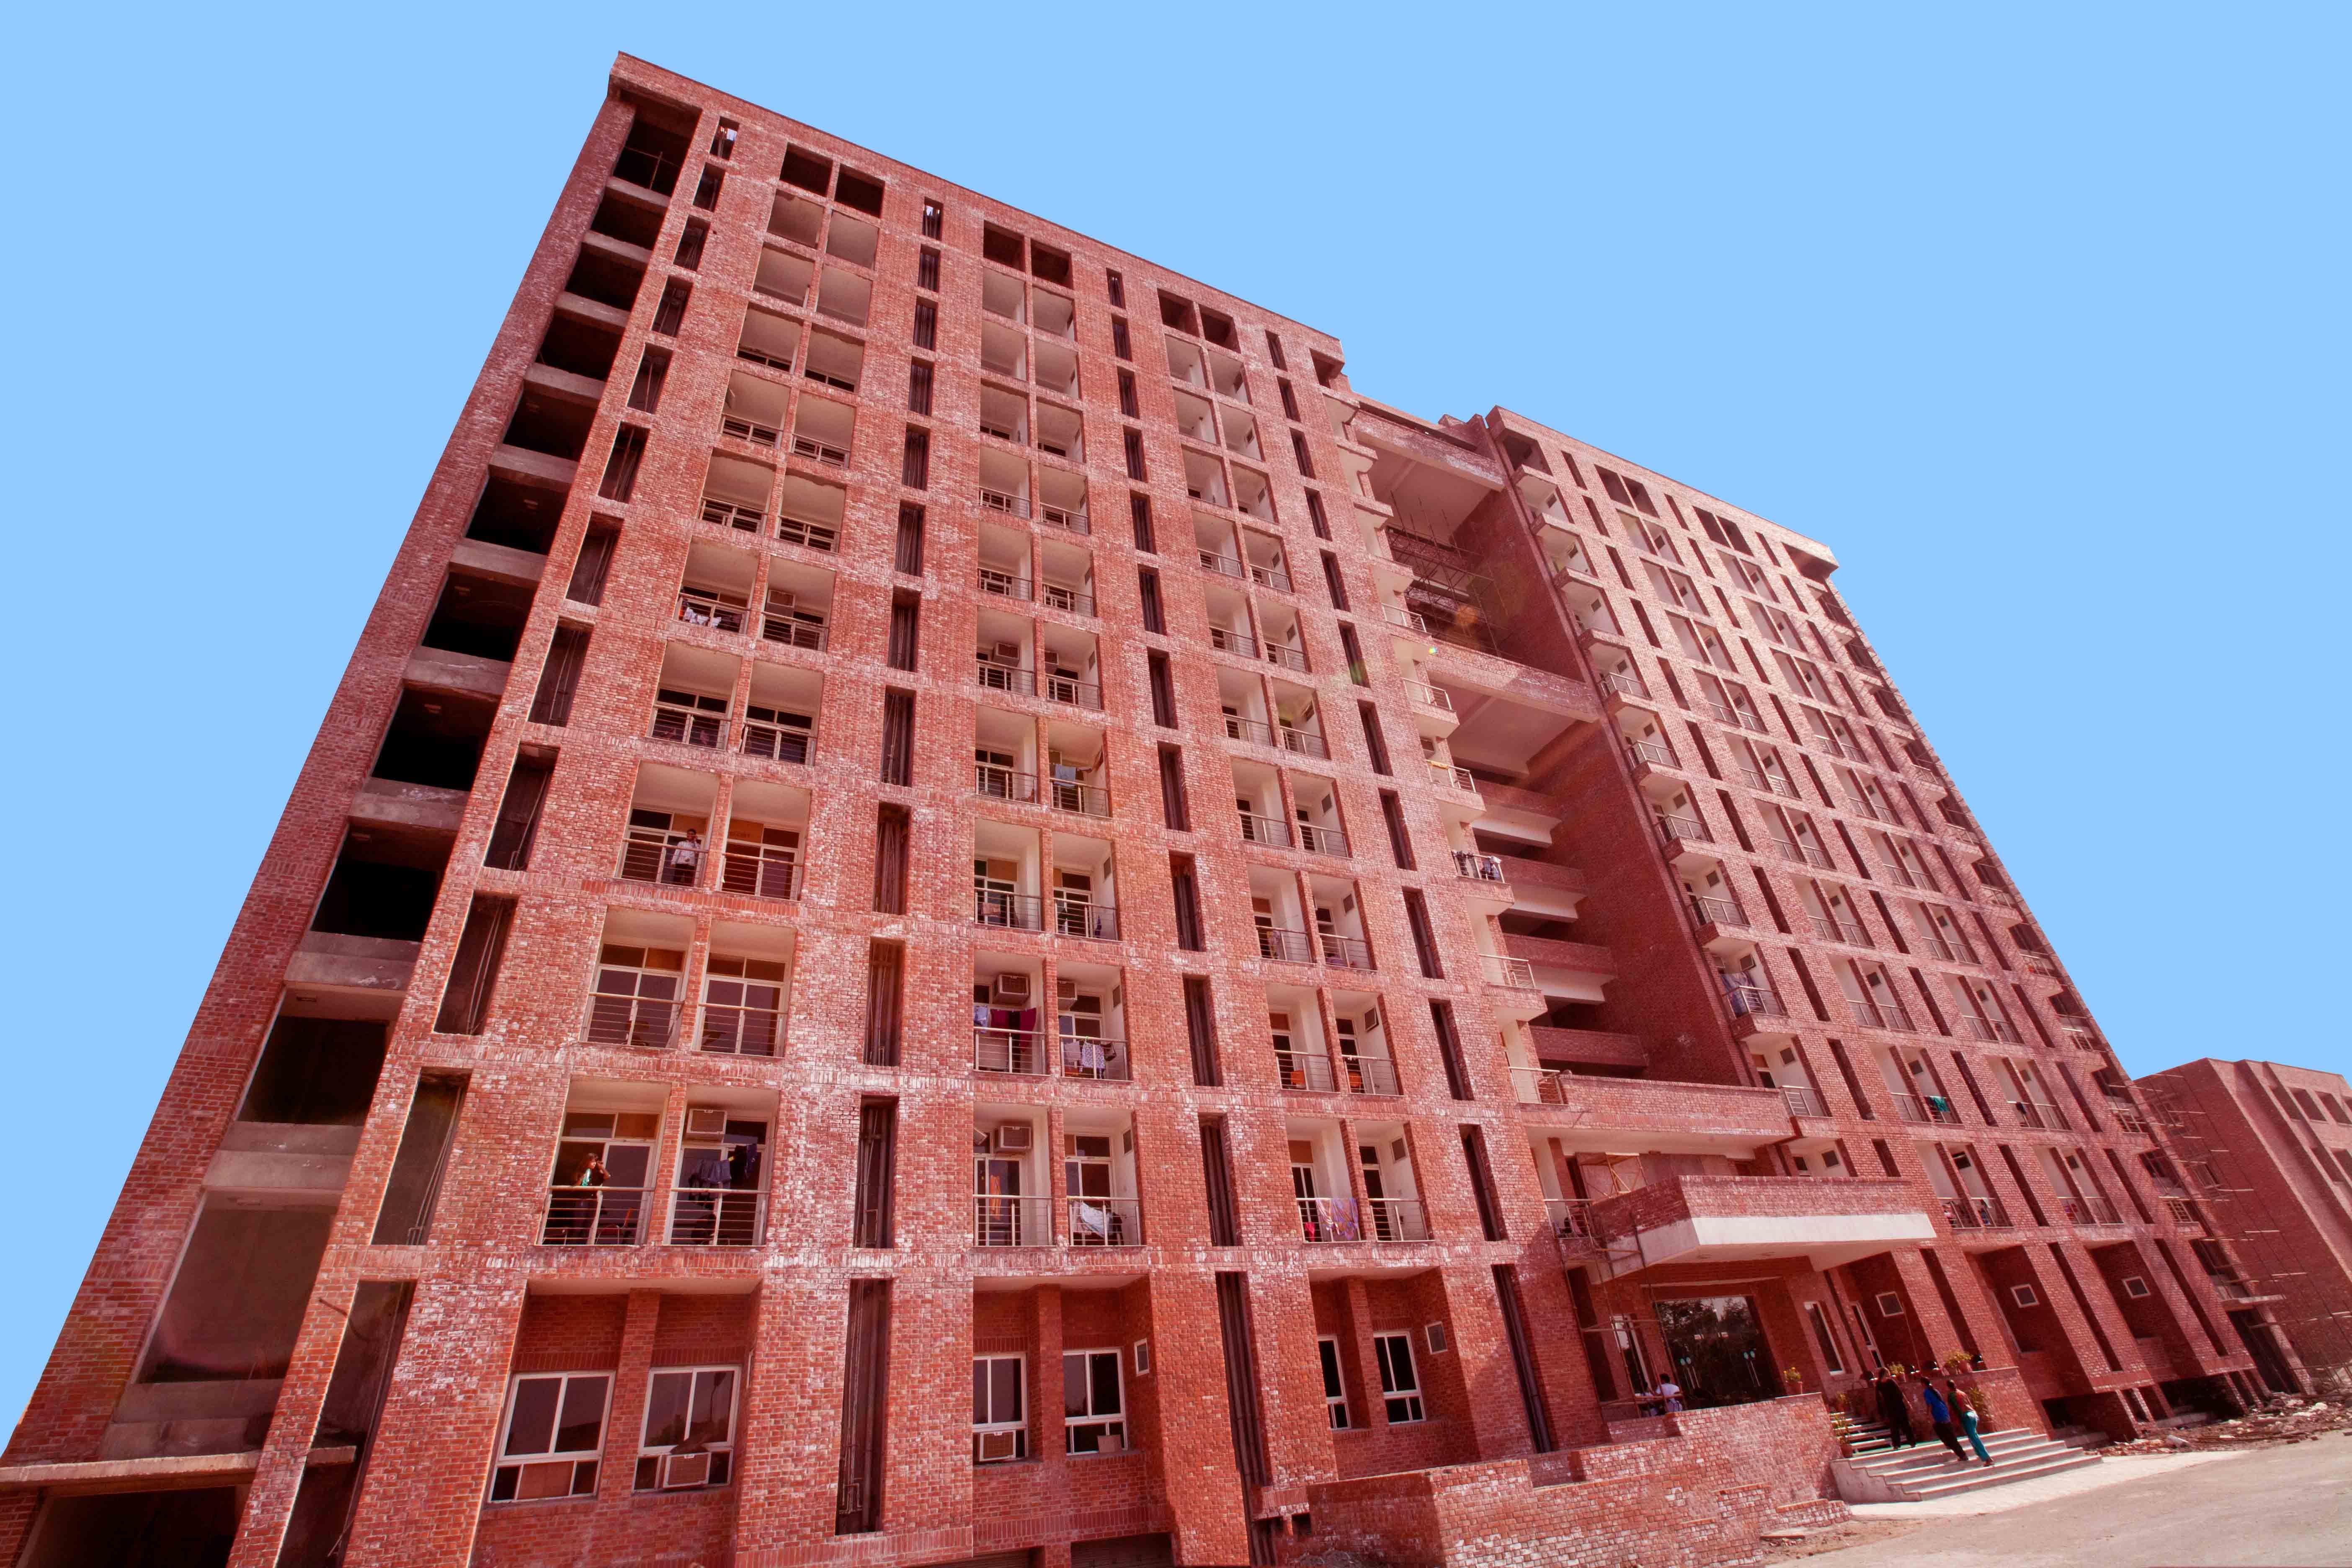 International Students Hostel Sharda University Campus Greater Noida University Campus Student Hostel School Of Engineering